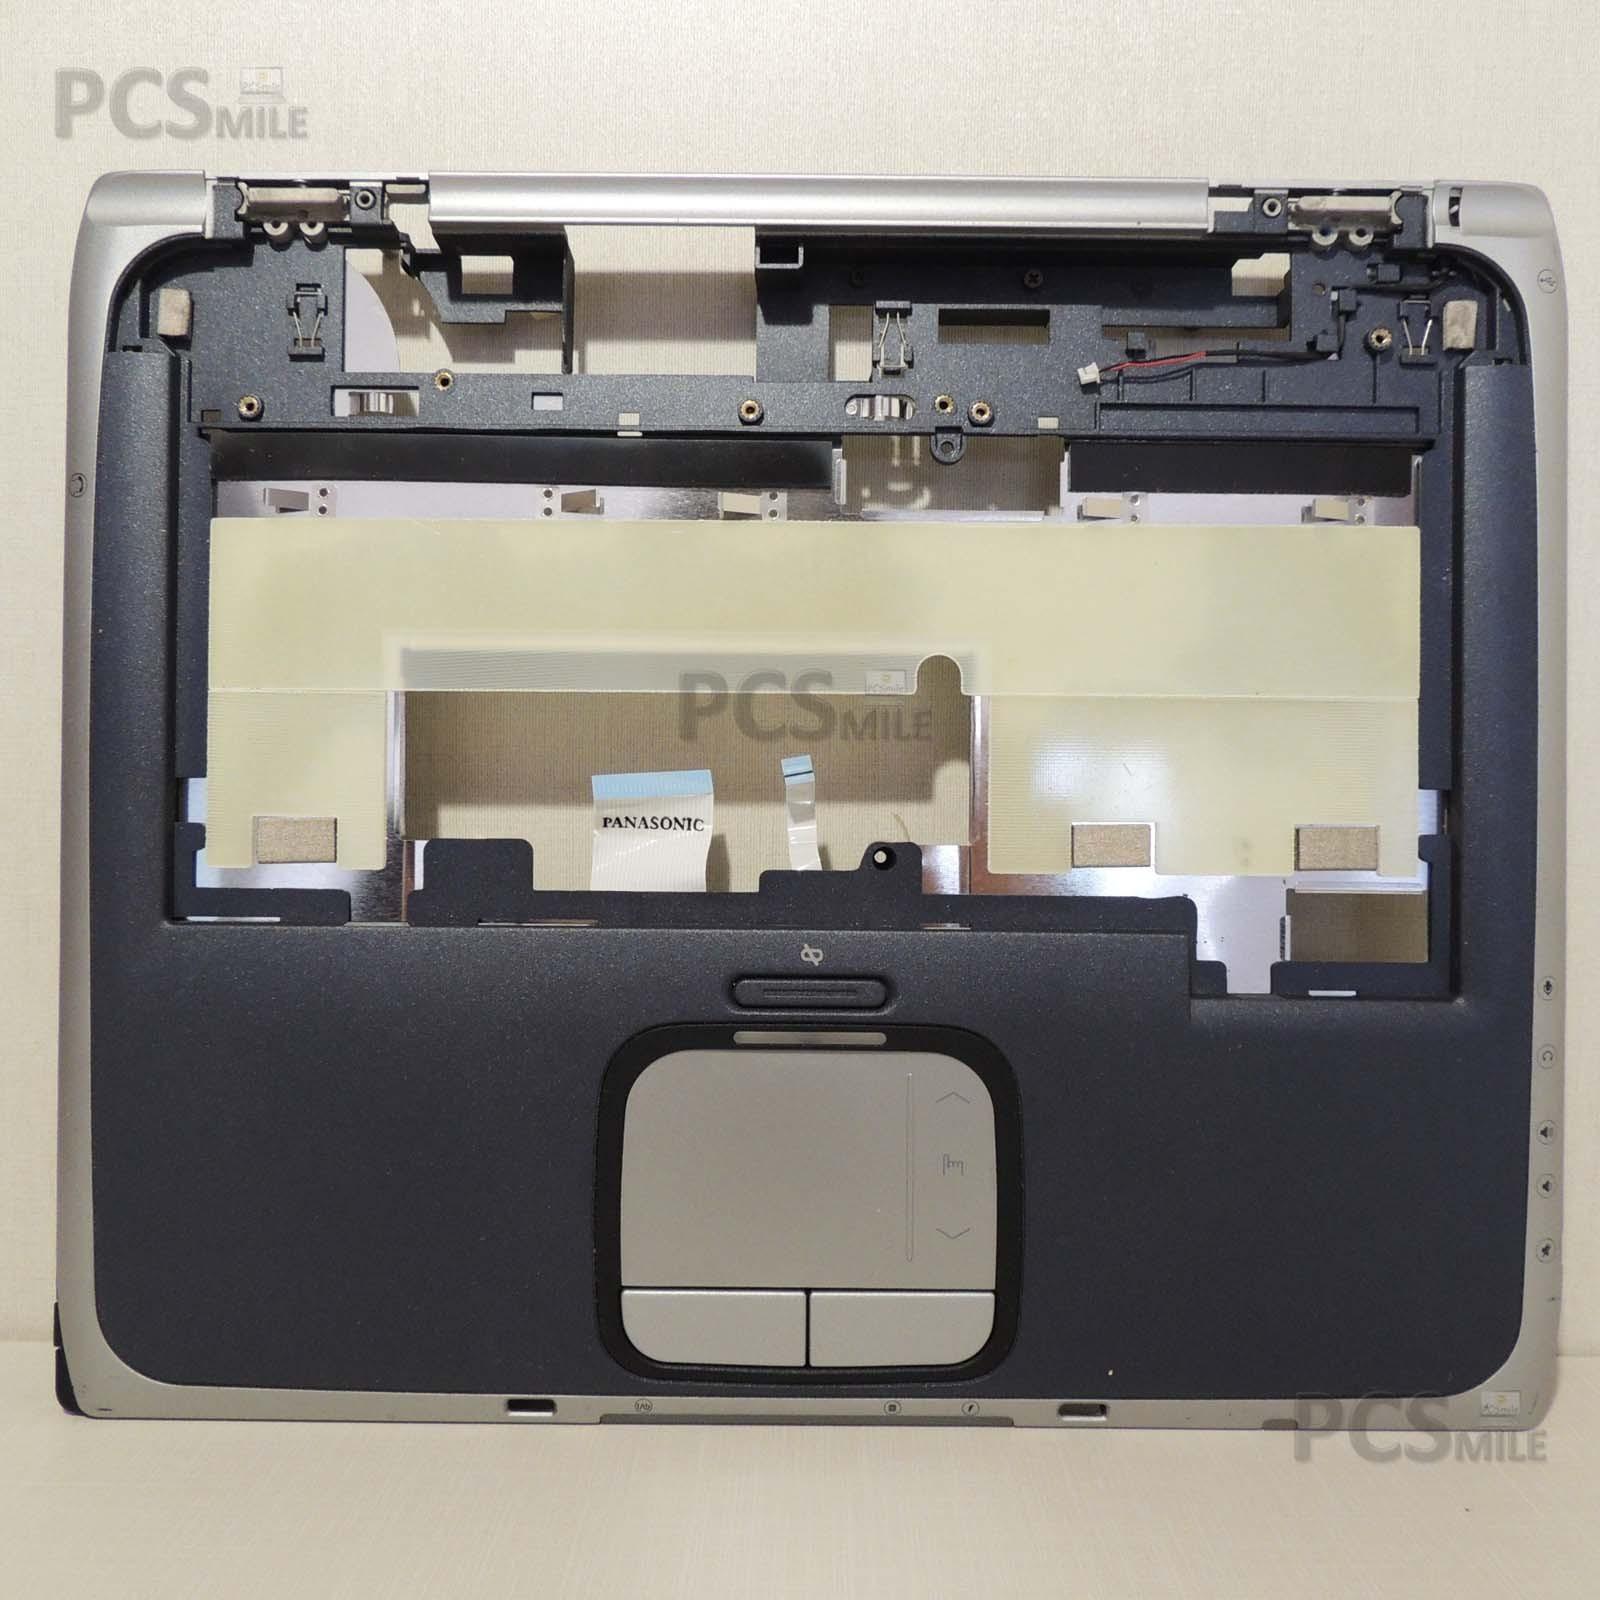 Scocca Touchpad poggia polsi HP Pavilion ZE5500 Lettore Floppy 44KT9TATP11